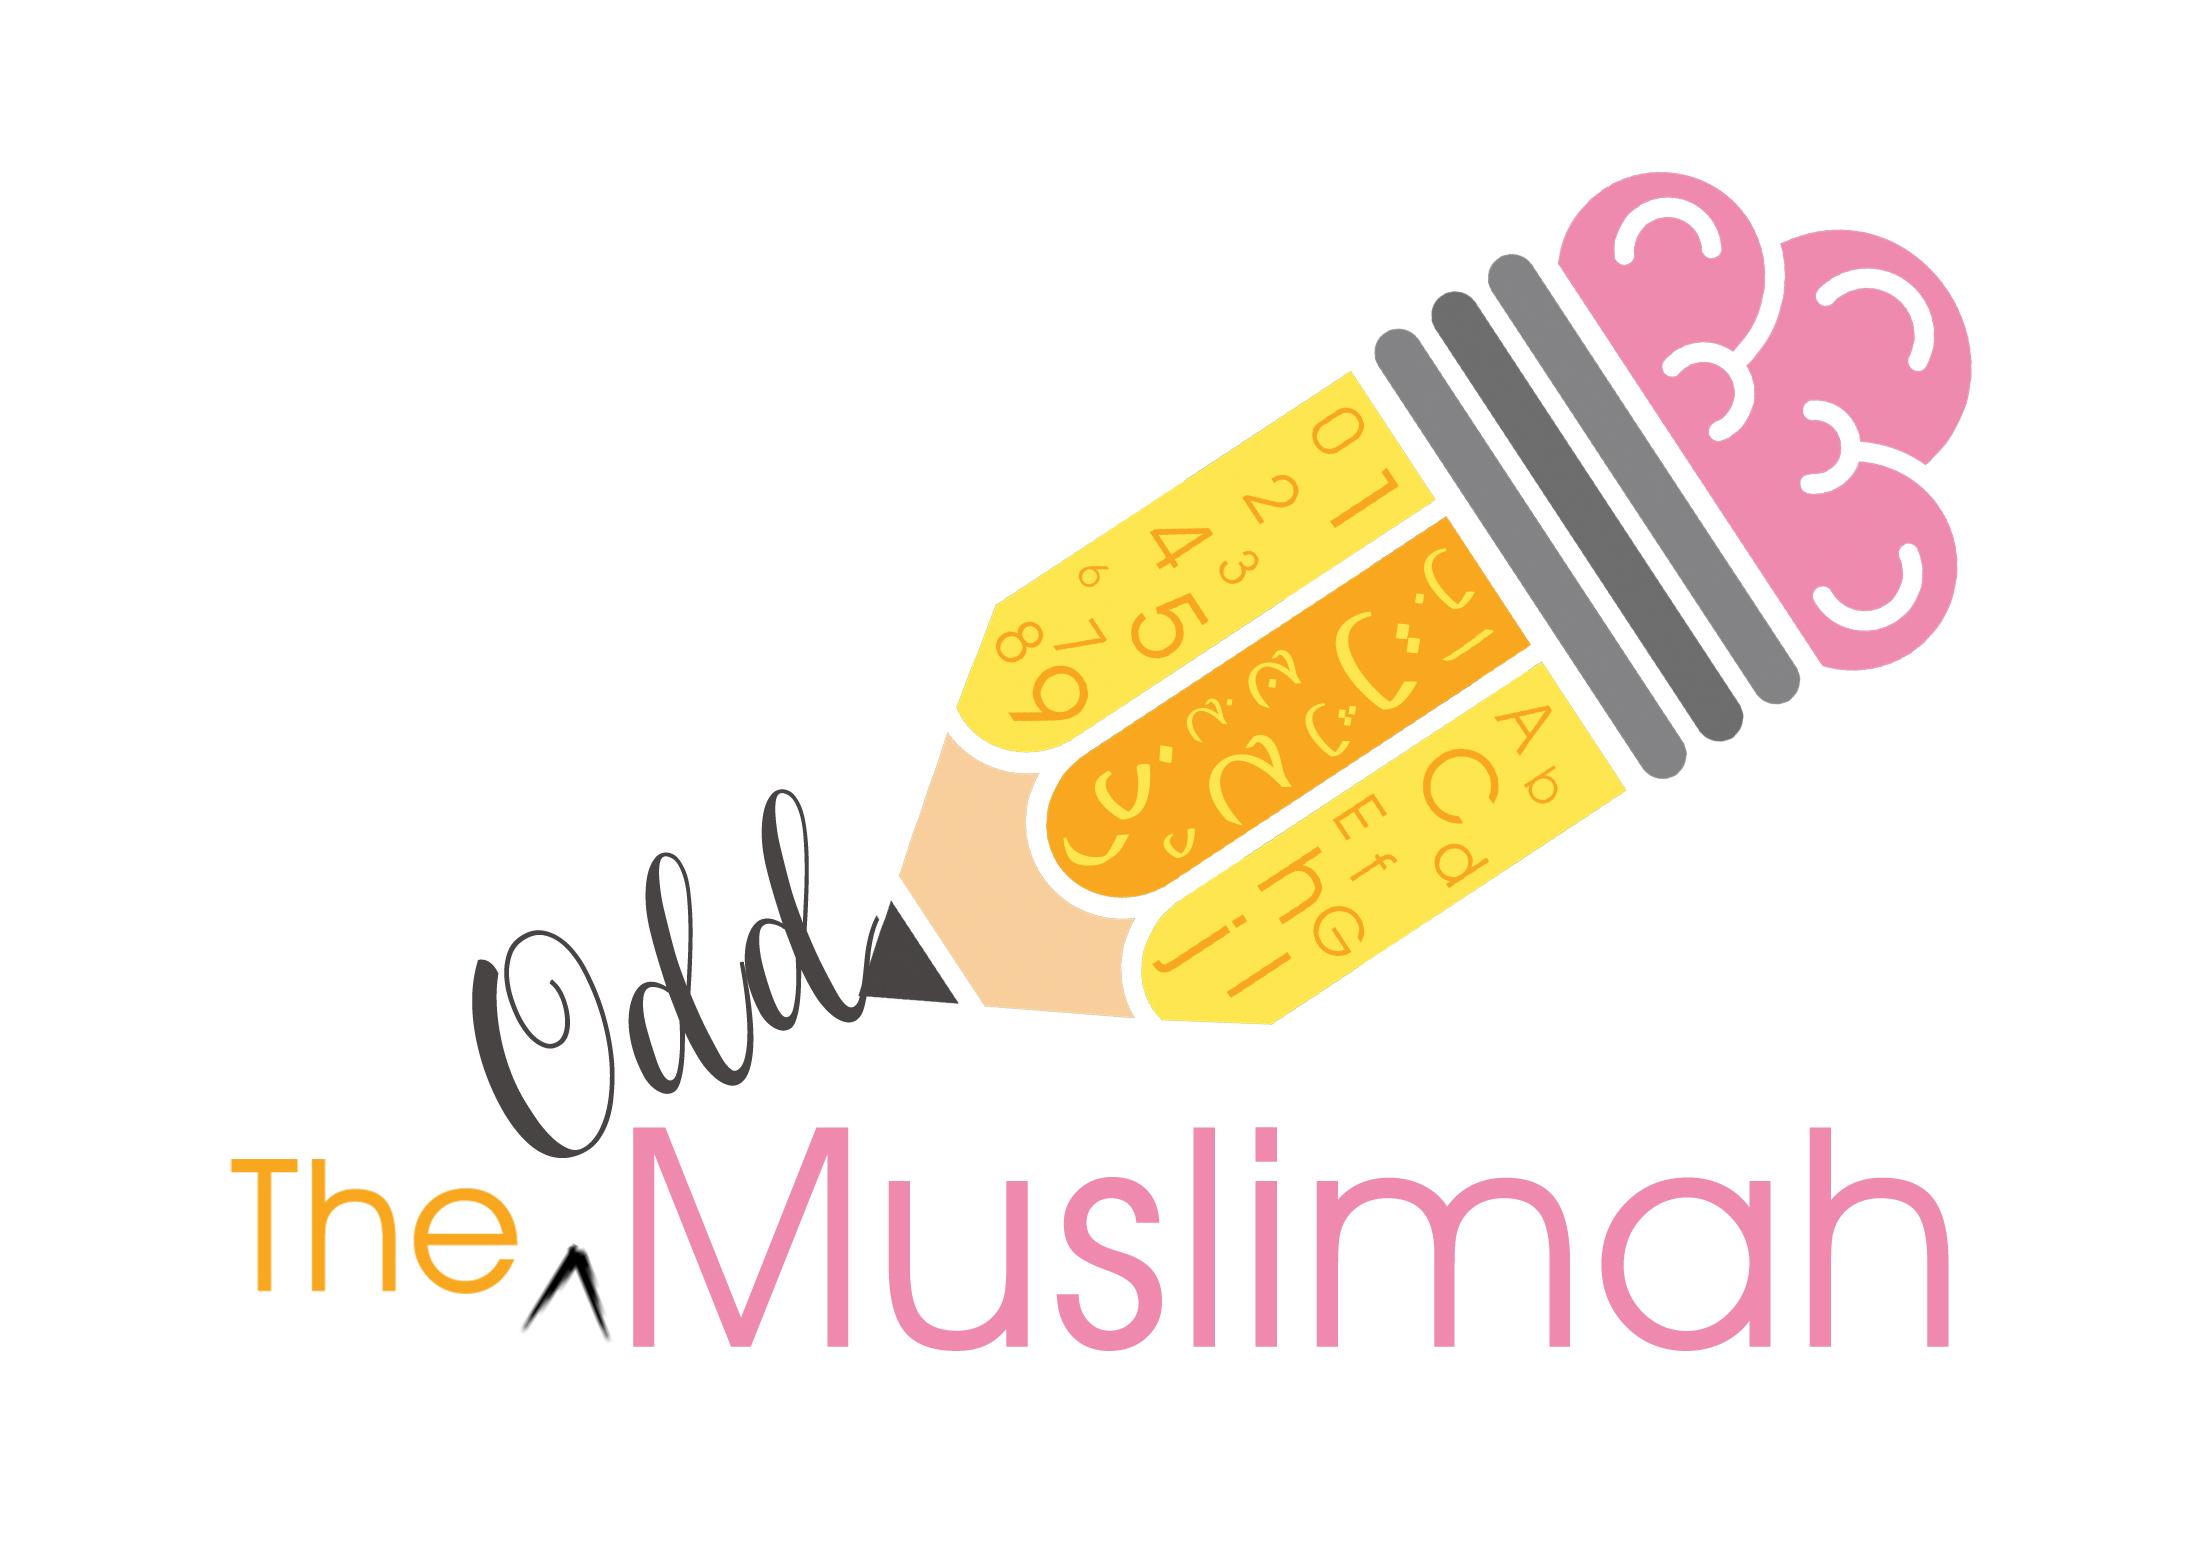 The Odd Muslimah